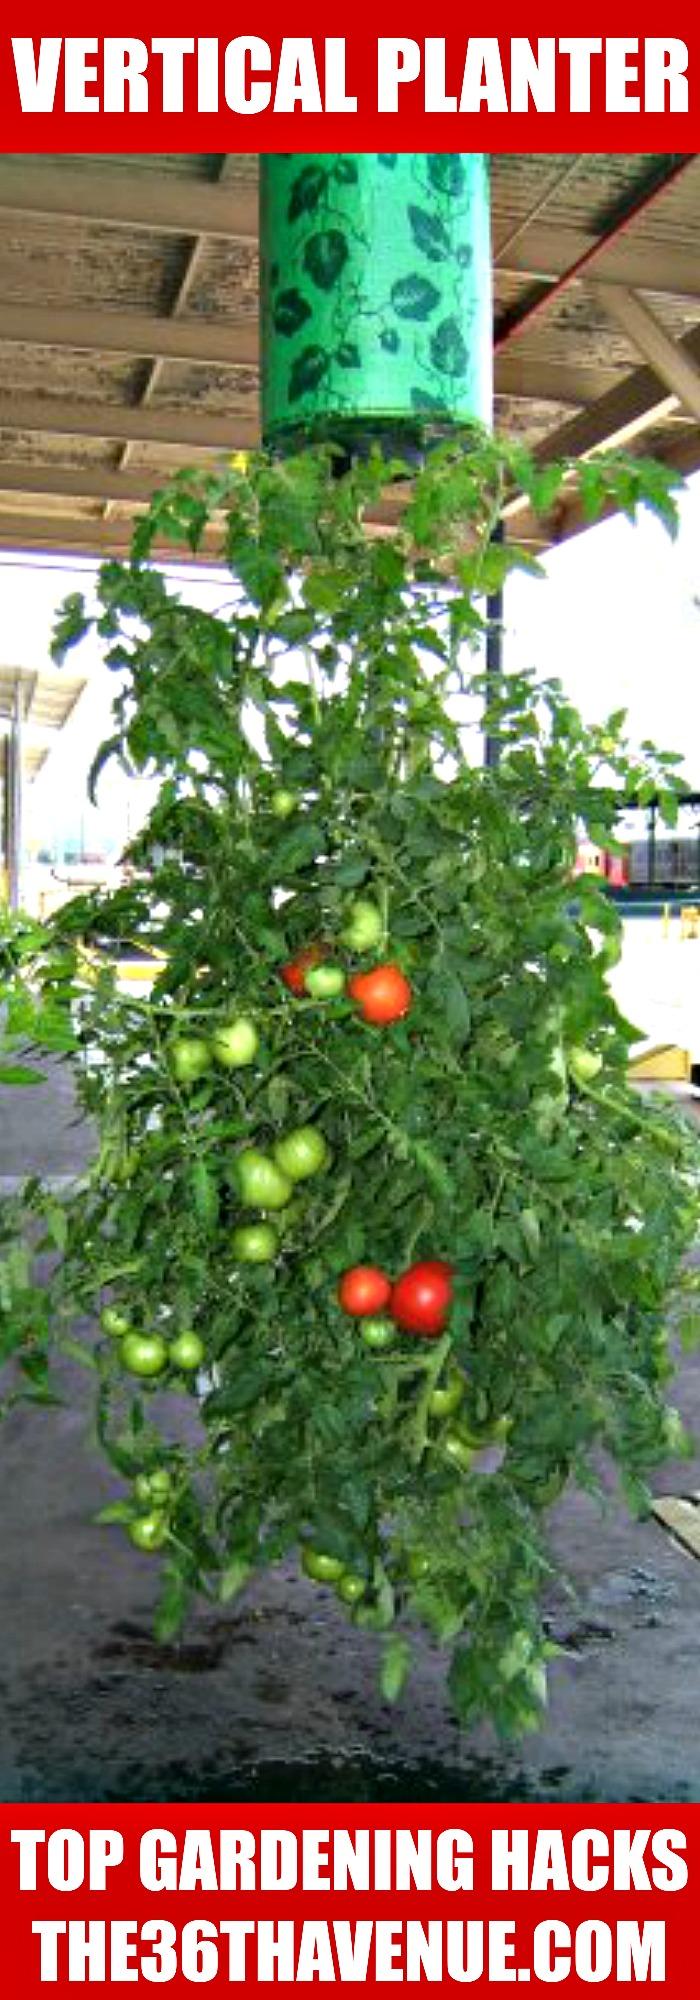 vertical planter the36thavenue.com